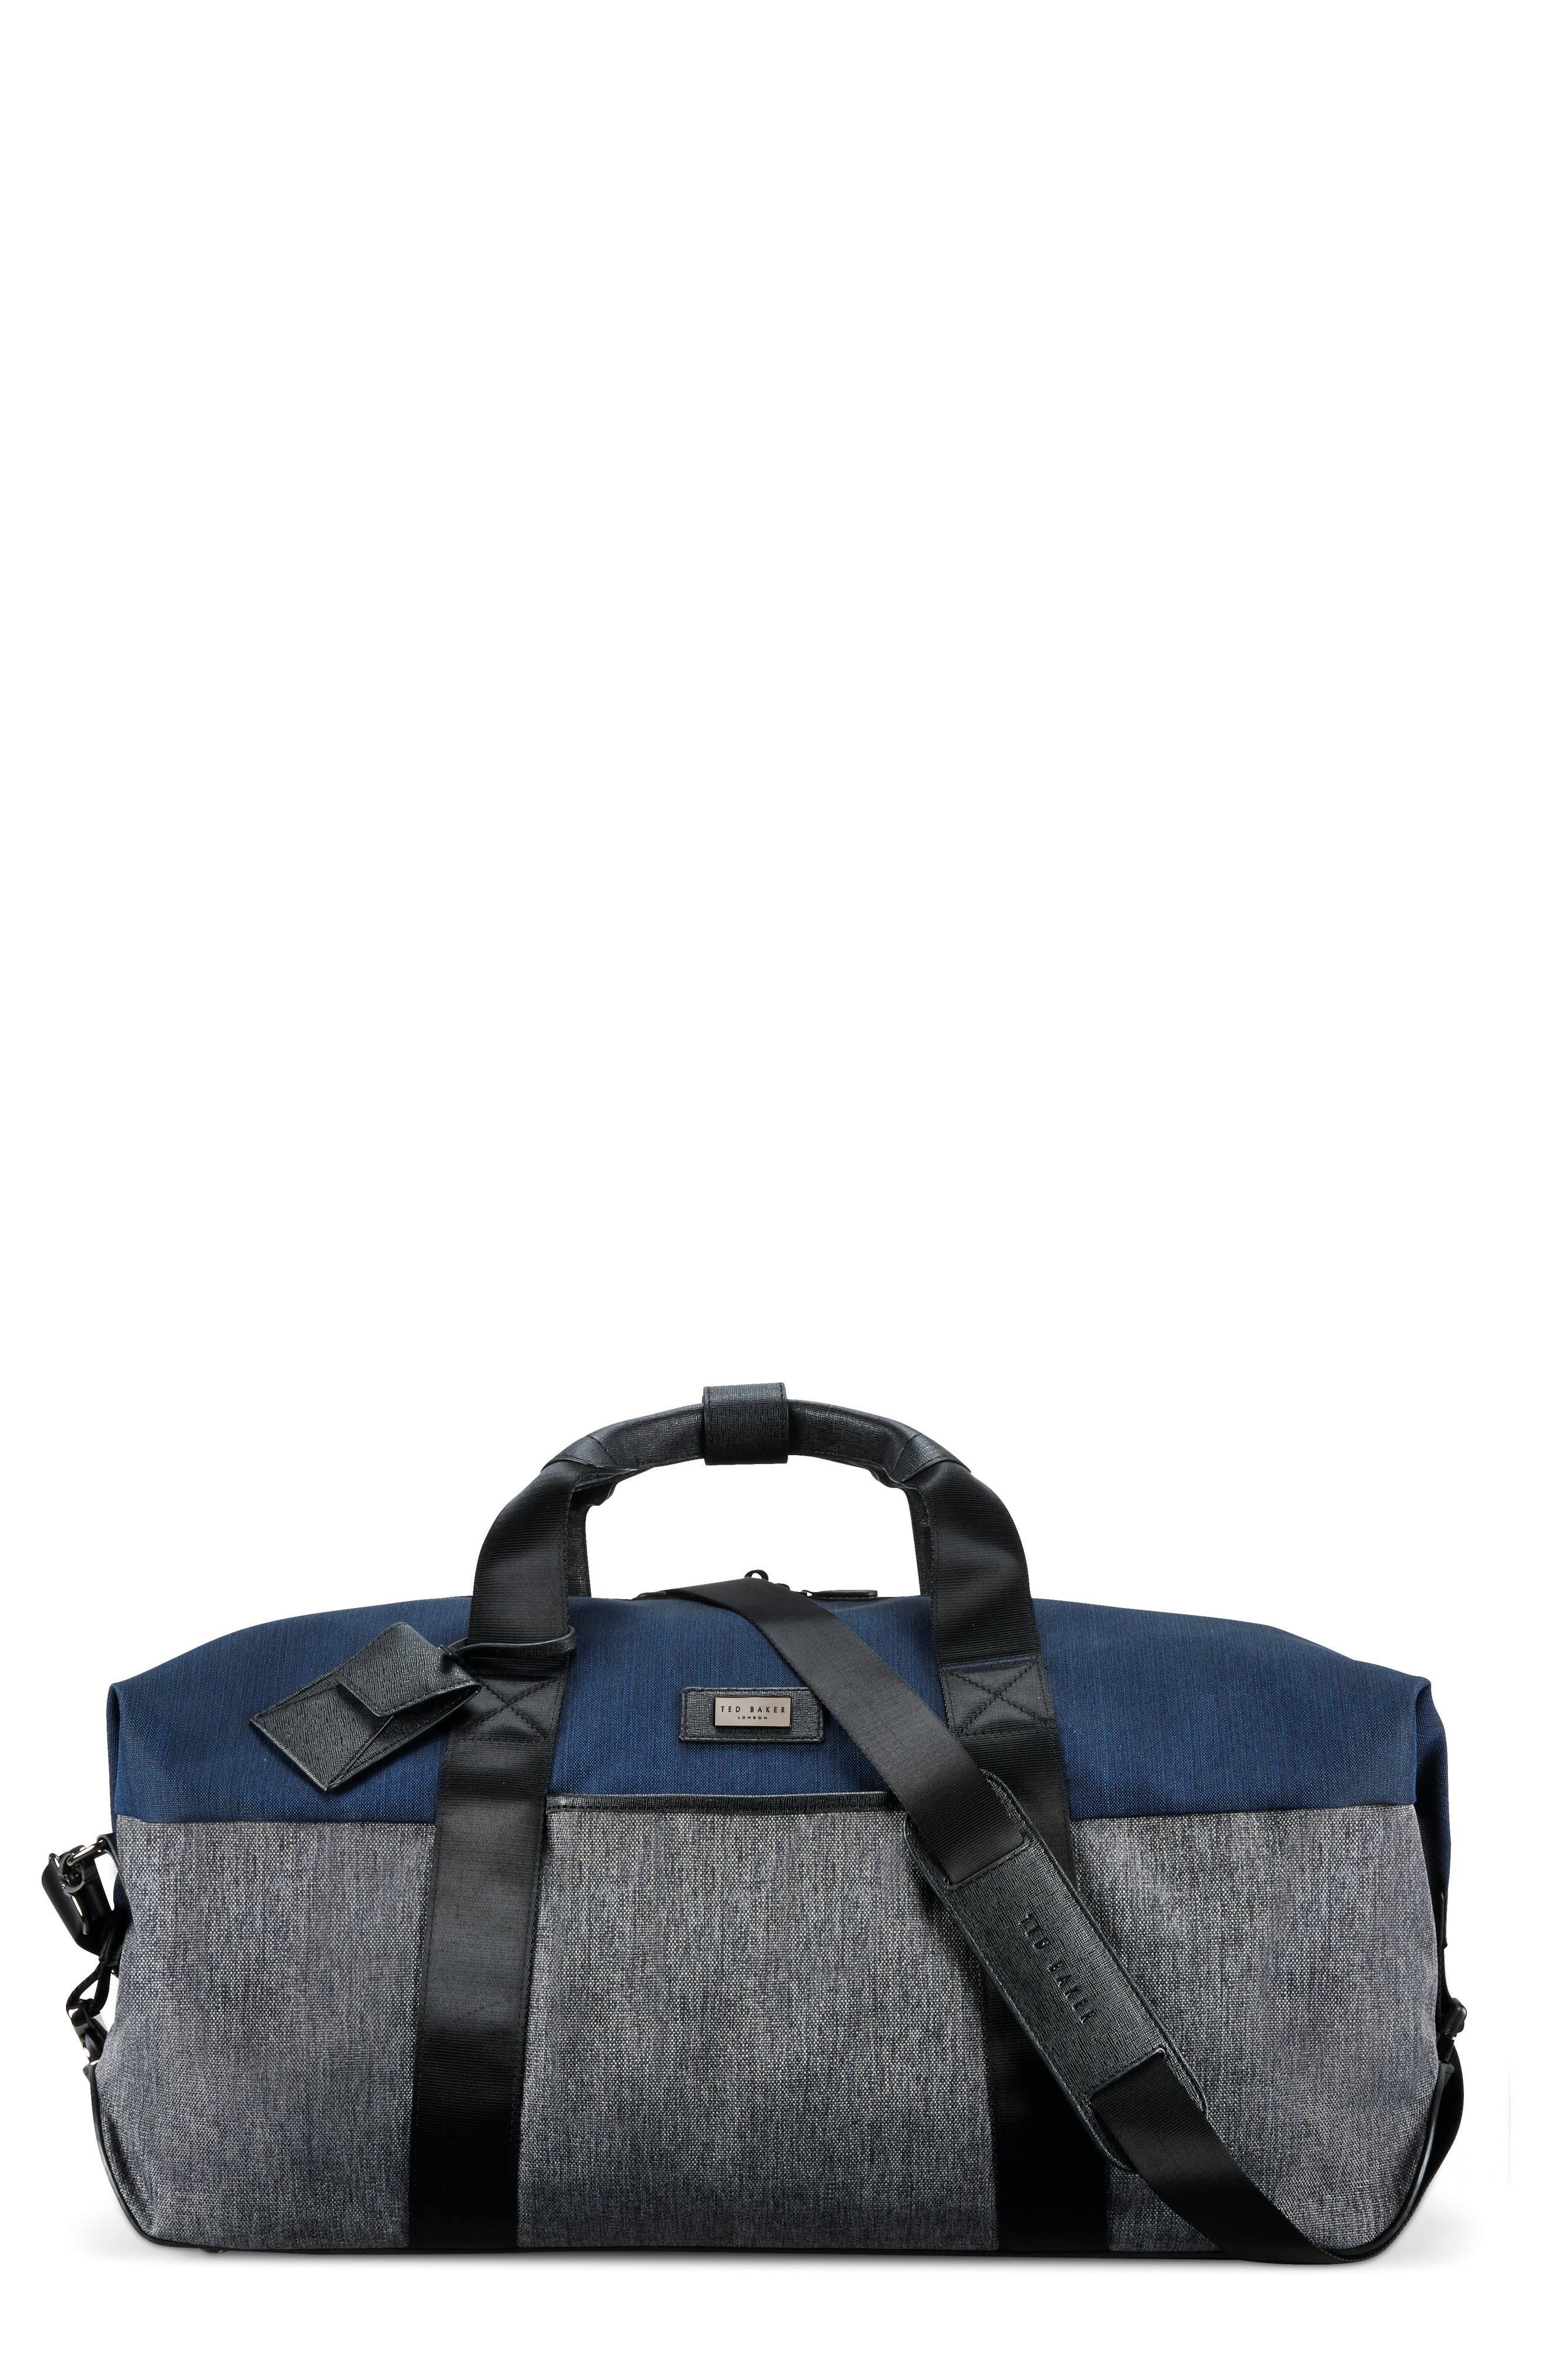 Medium Brunswick Water Resistant Duffel Bag,                             Main thumbnail 1, color,                             Grey